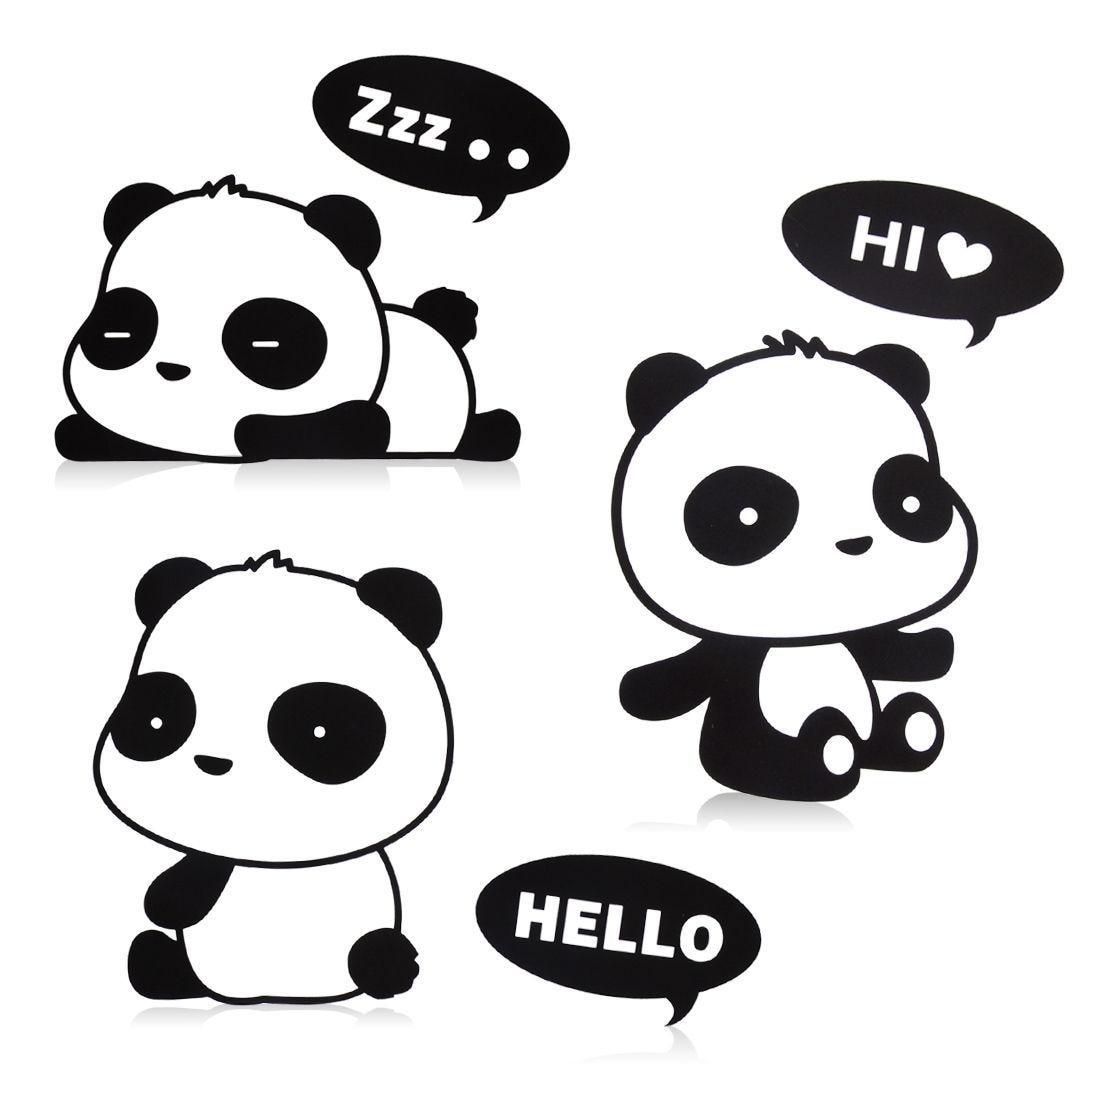 3Pcs Fashion Panda DIY Switch Sticker Notebook Stickers Vinyl Mural Decor Decals PCs